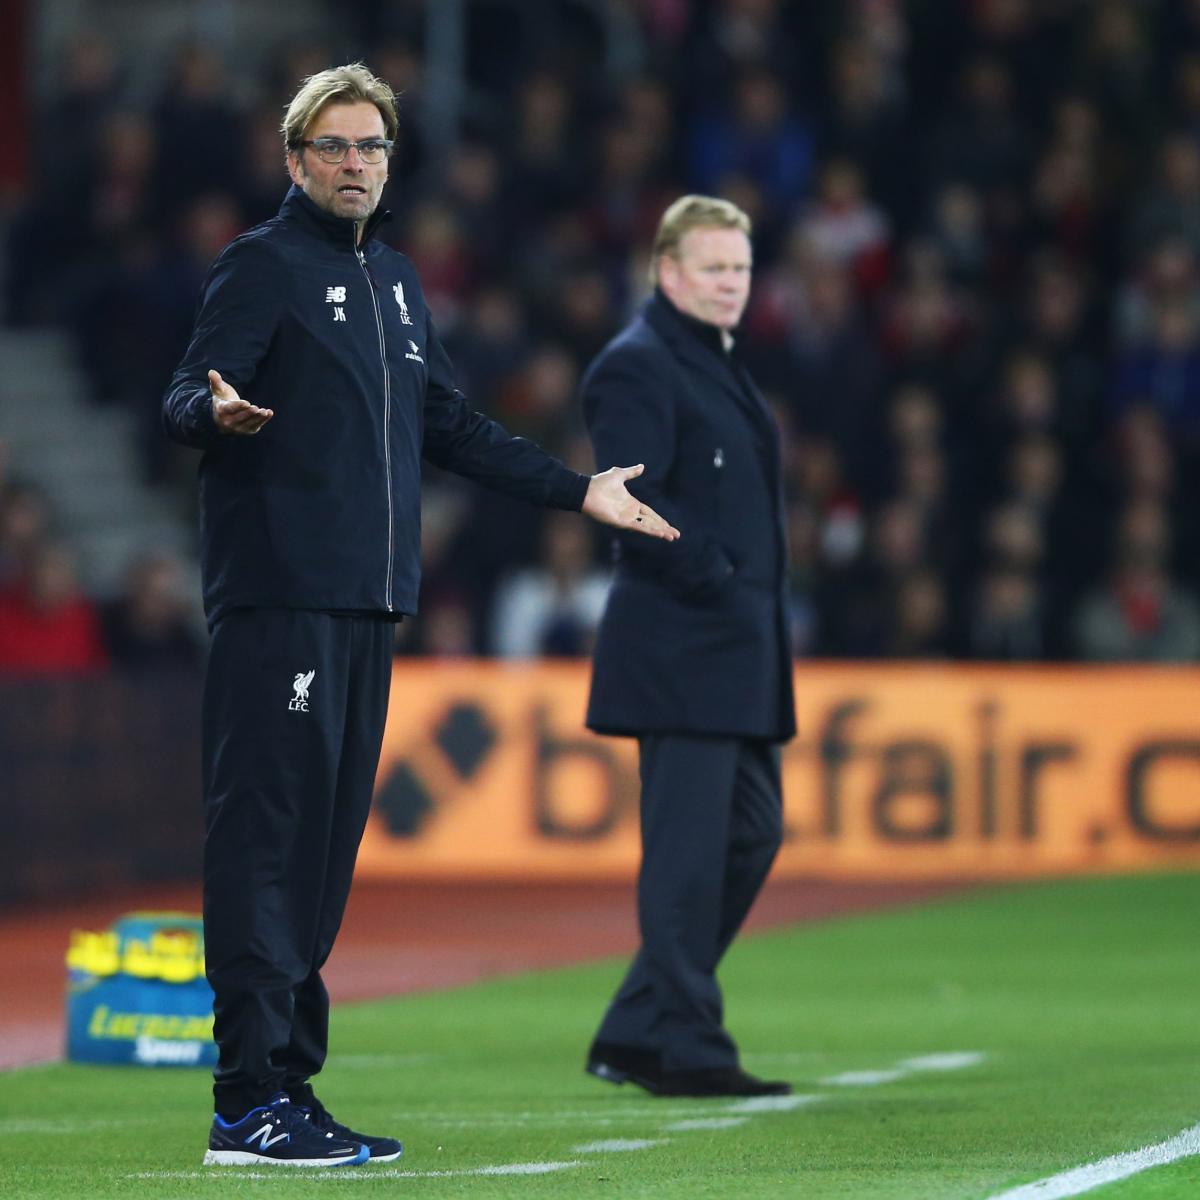 Live Streaming Soccer News Liverpool Vs Benfica Live: Southampton Vs. Liverpool: Team News, Live Stream, TV Info